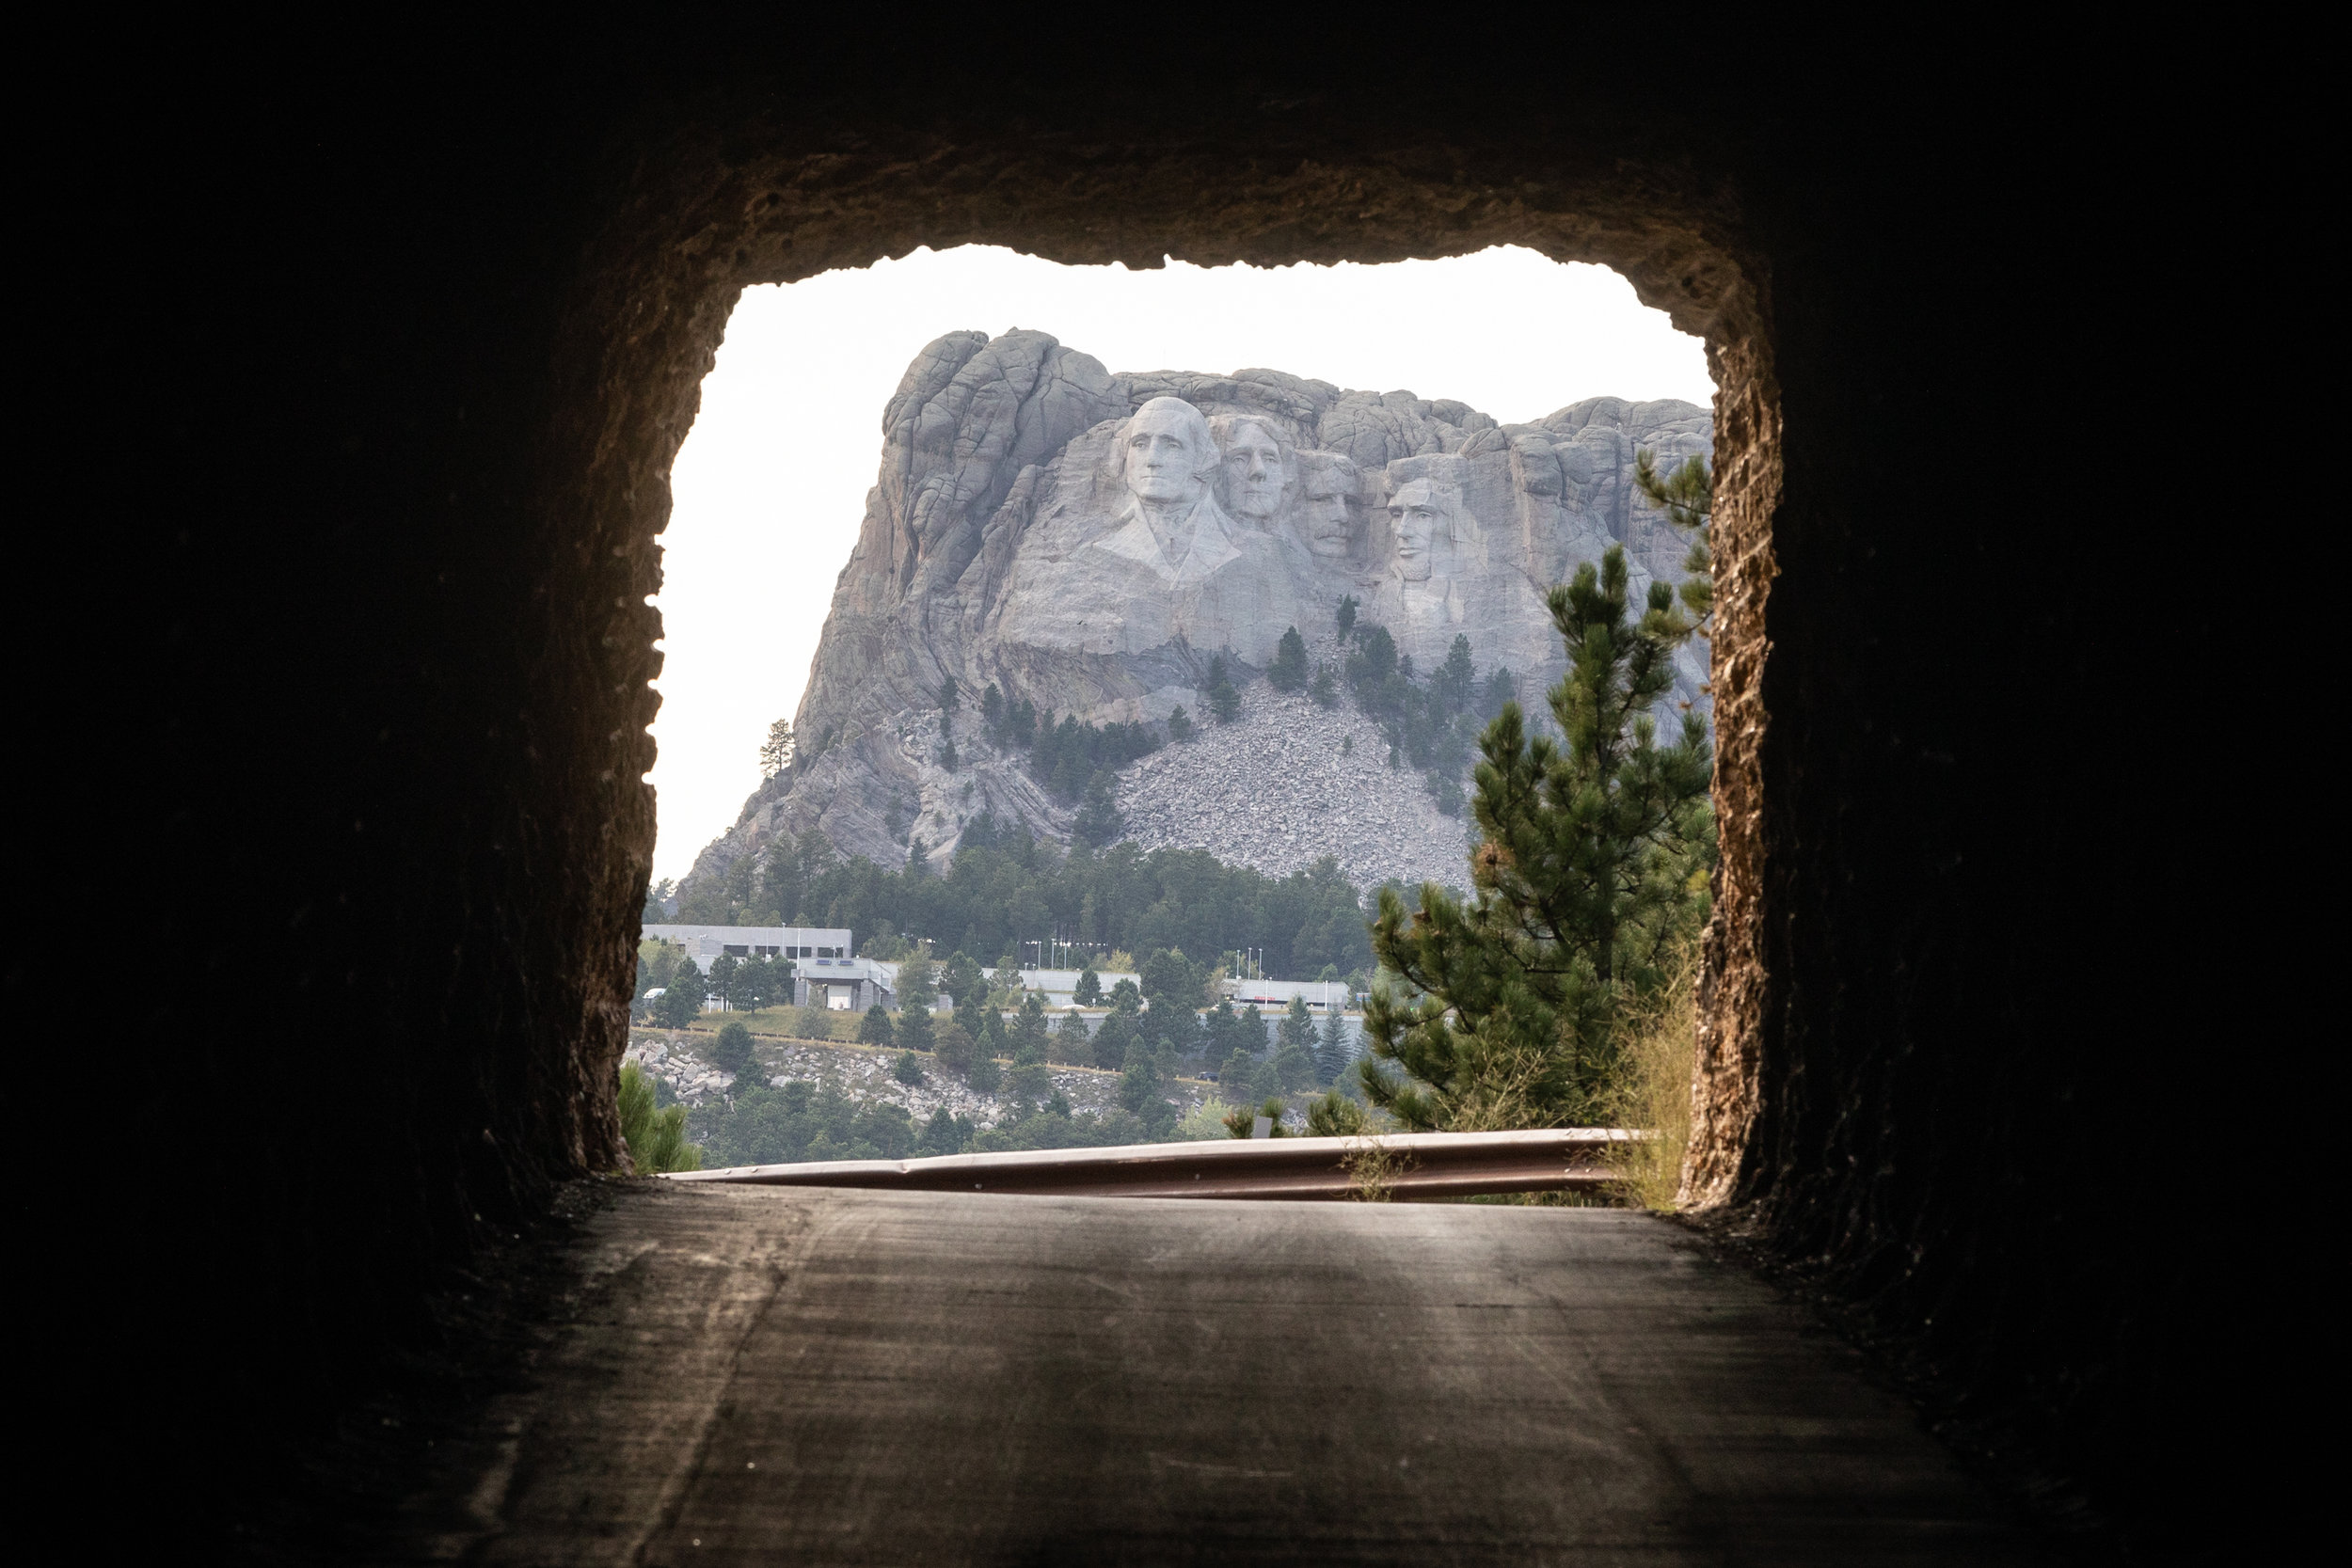 Mount Rushmore viewed through the Doane Robinson Tunnel on Iron Mountain Road, Custer State Park, South Dakota [August, 2018]